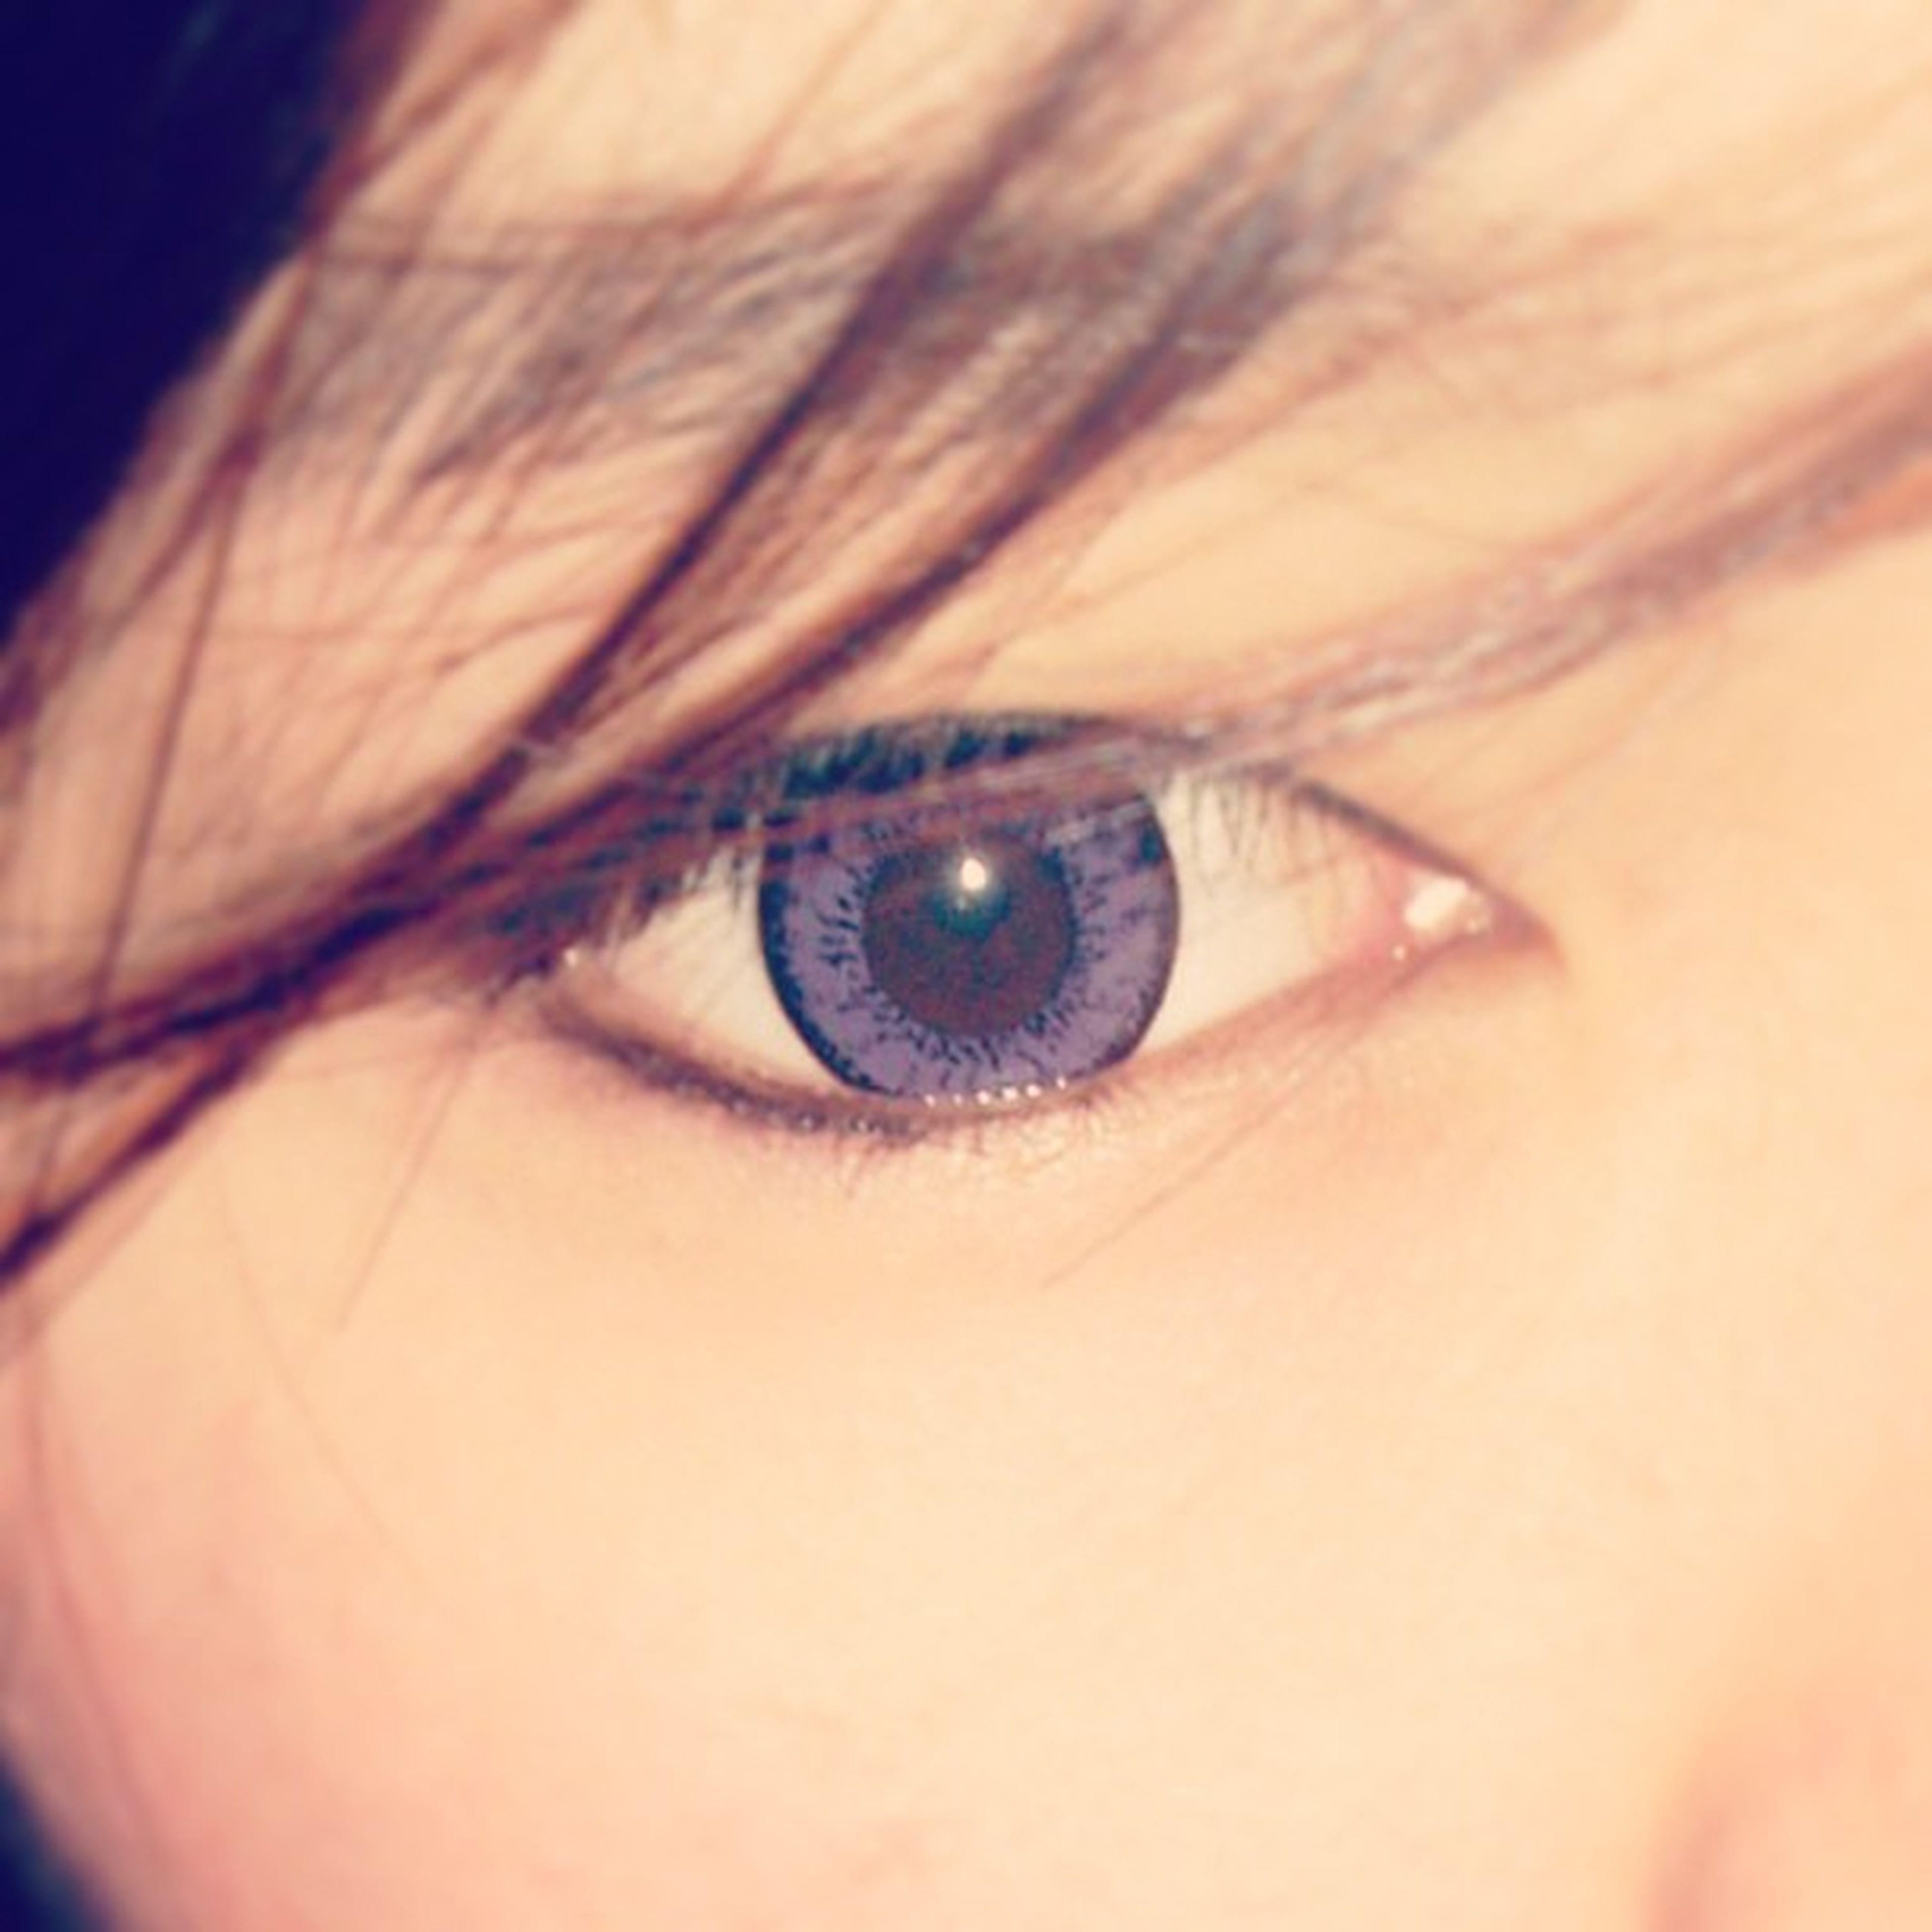 human eye, close-up, eyelash, human face, eyesight, part of, looking at camera, portrait, human skin, iris - eye, lifestyles, headshot, sensory perception, eyeball, eyebrow, extreme close up, indoors